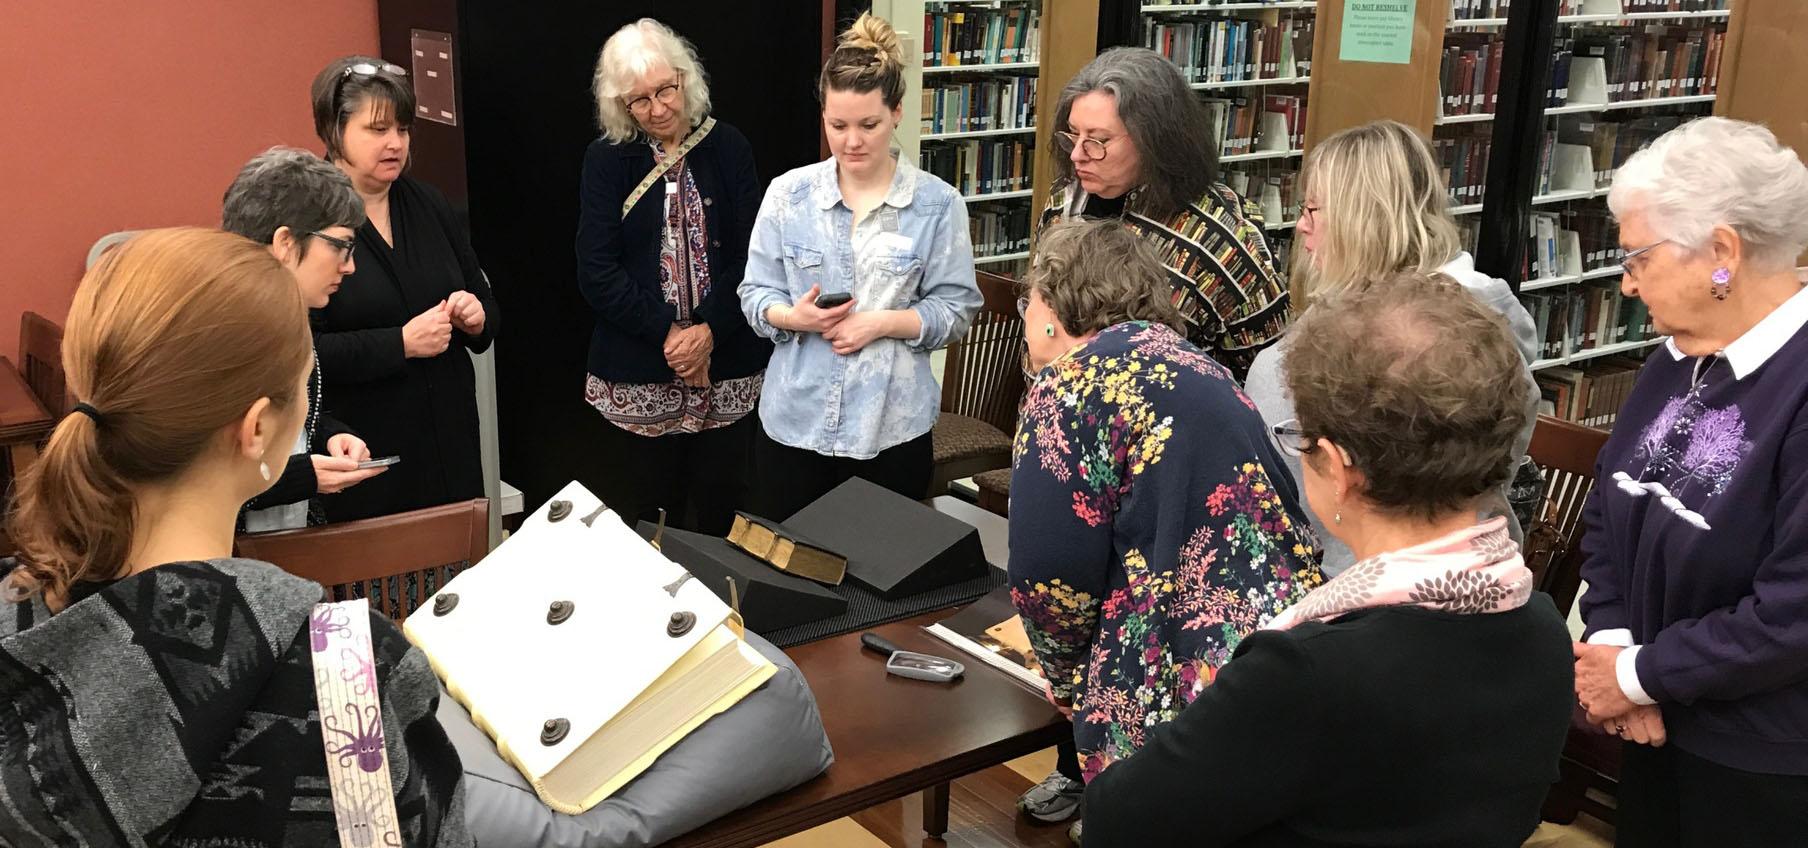 Teachers and Librarians gather around materials